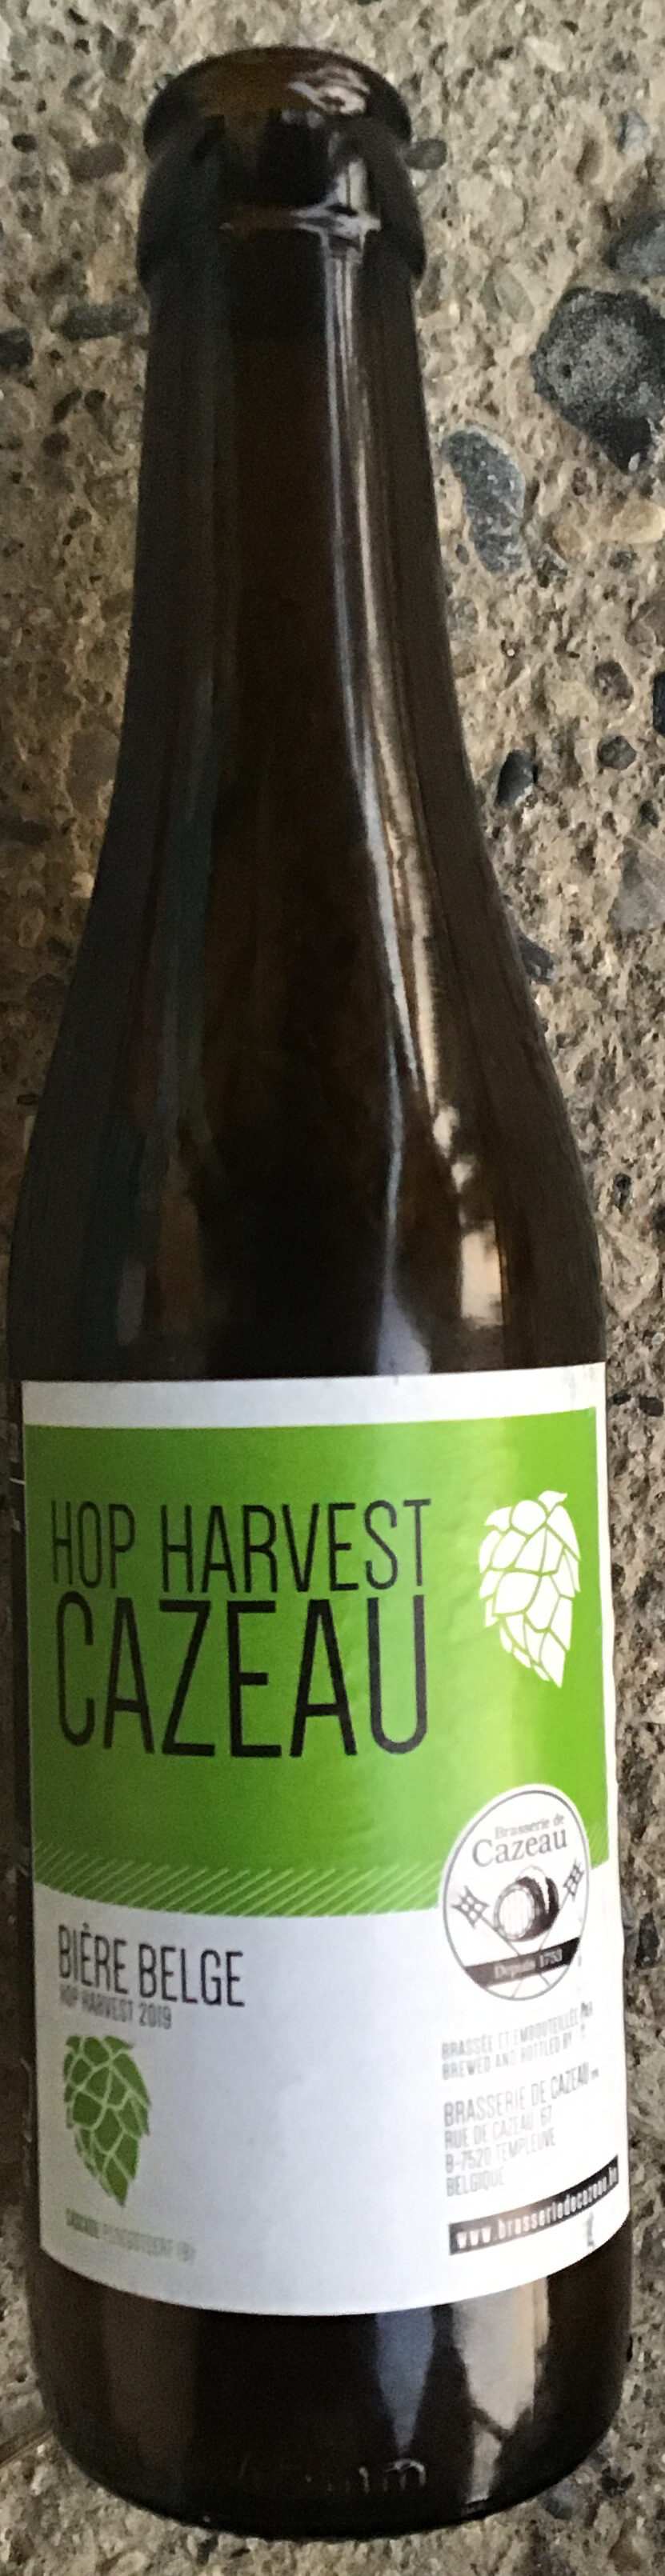 Hop harvest - Product